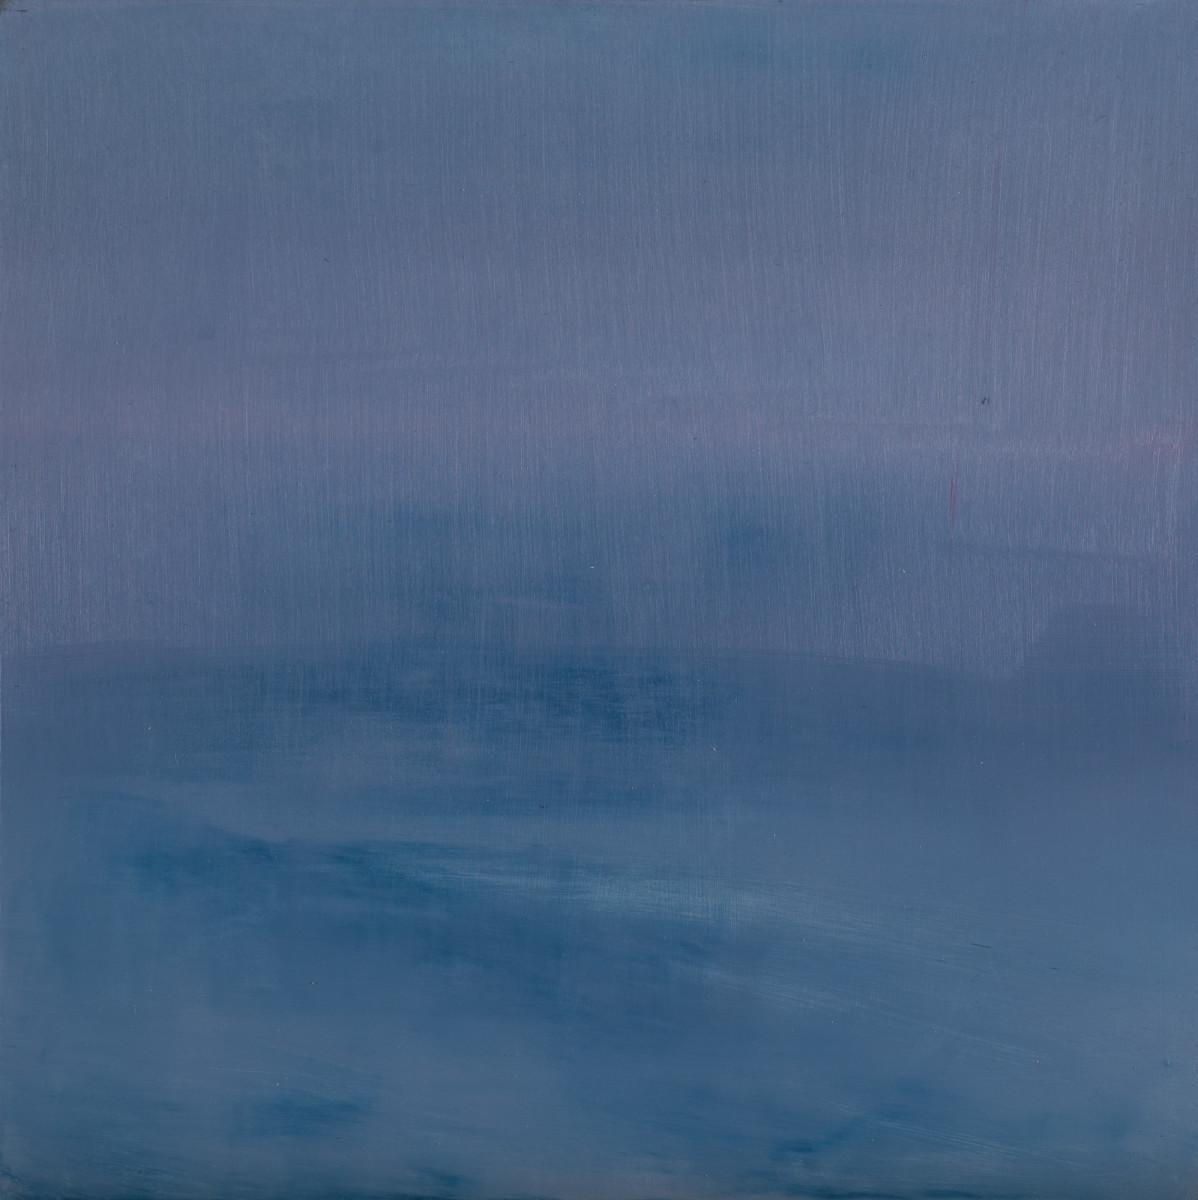 Study 11 (Waves) by Claudia de Grandi